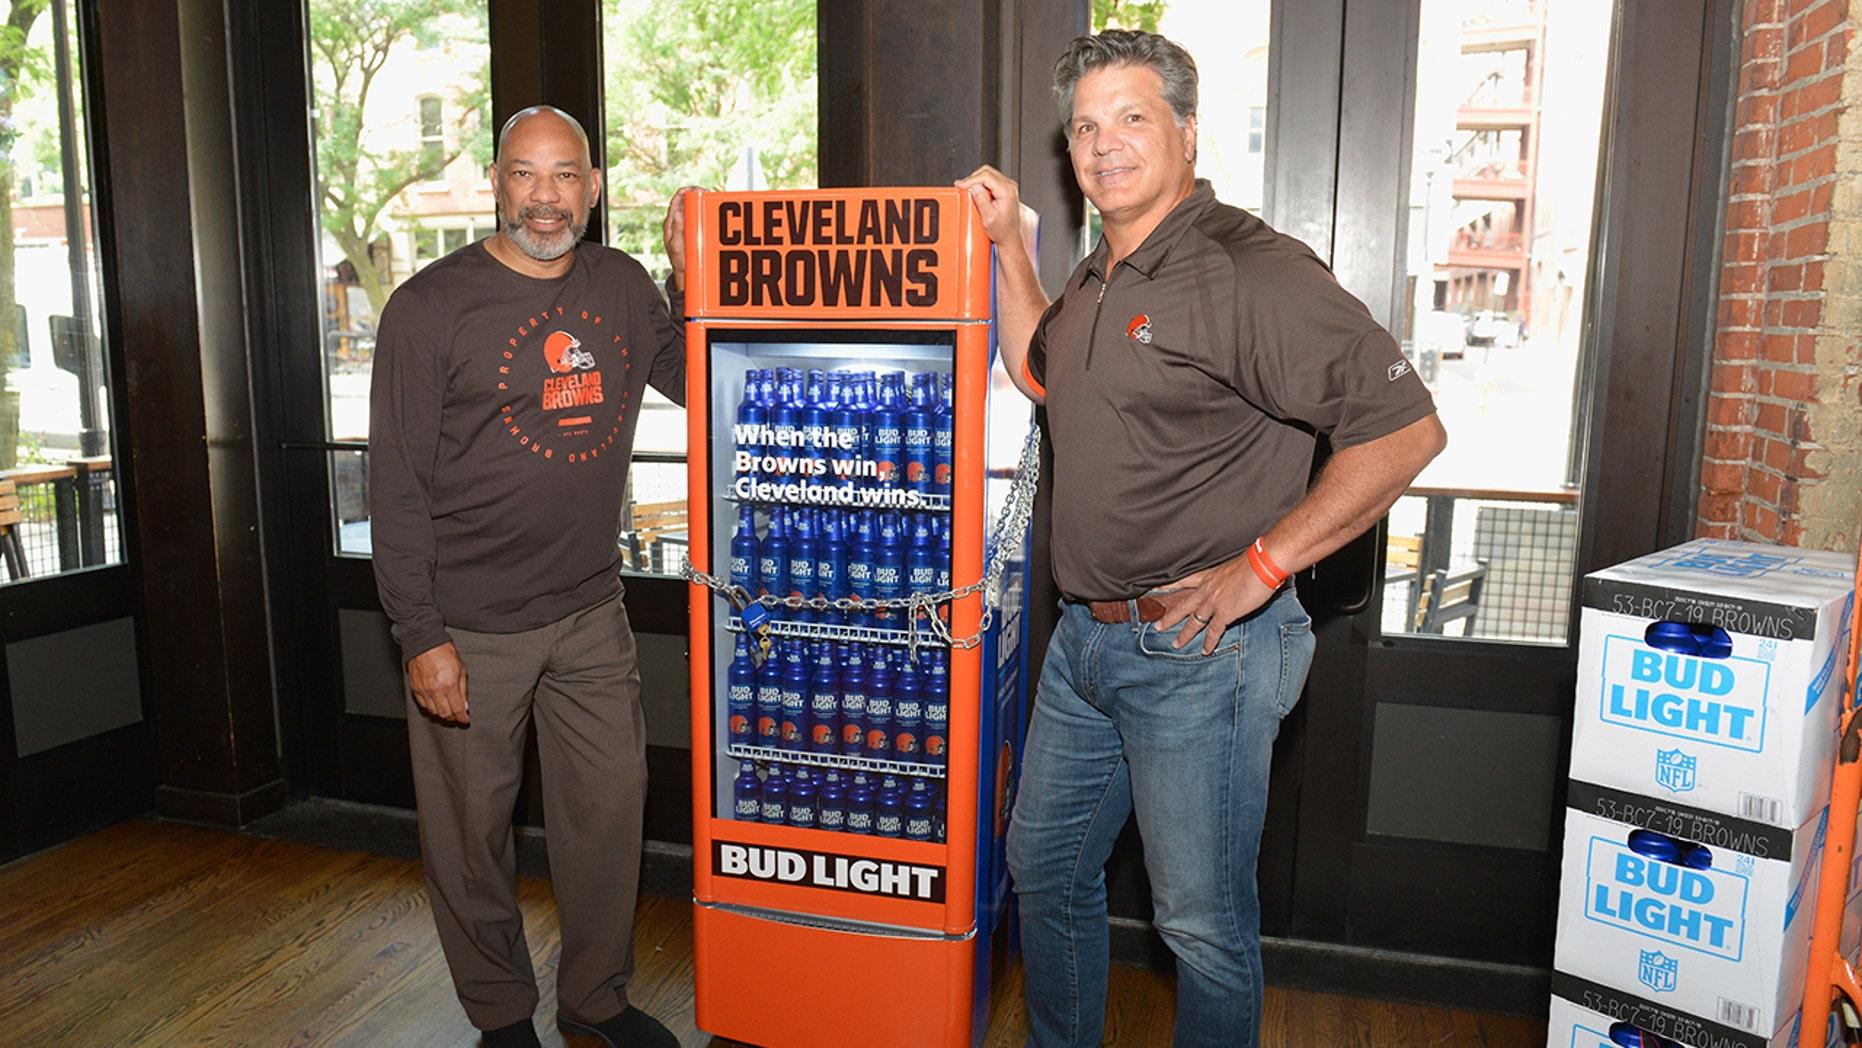 Bud Light promises Cleveland Browns fans free beer after